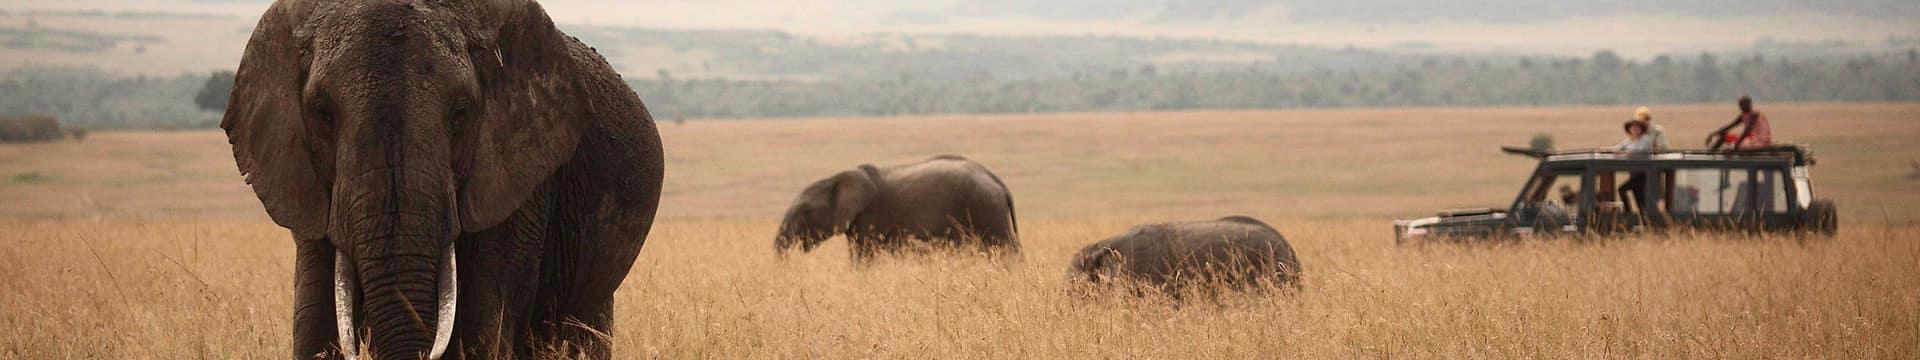 África | Pacotes Kangaroo Tours